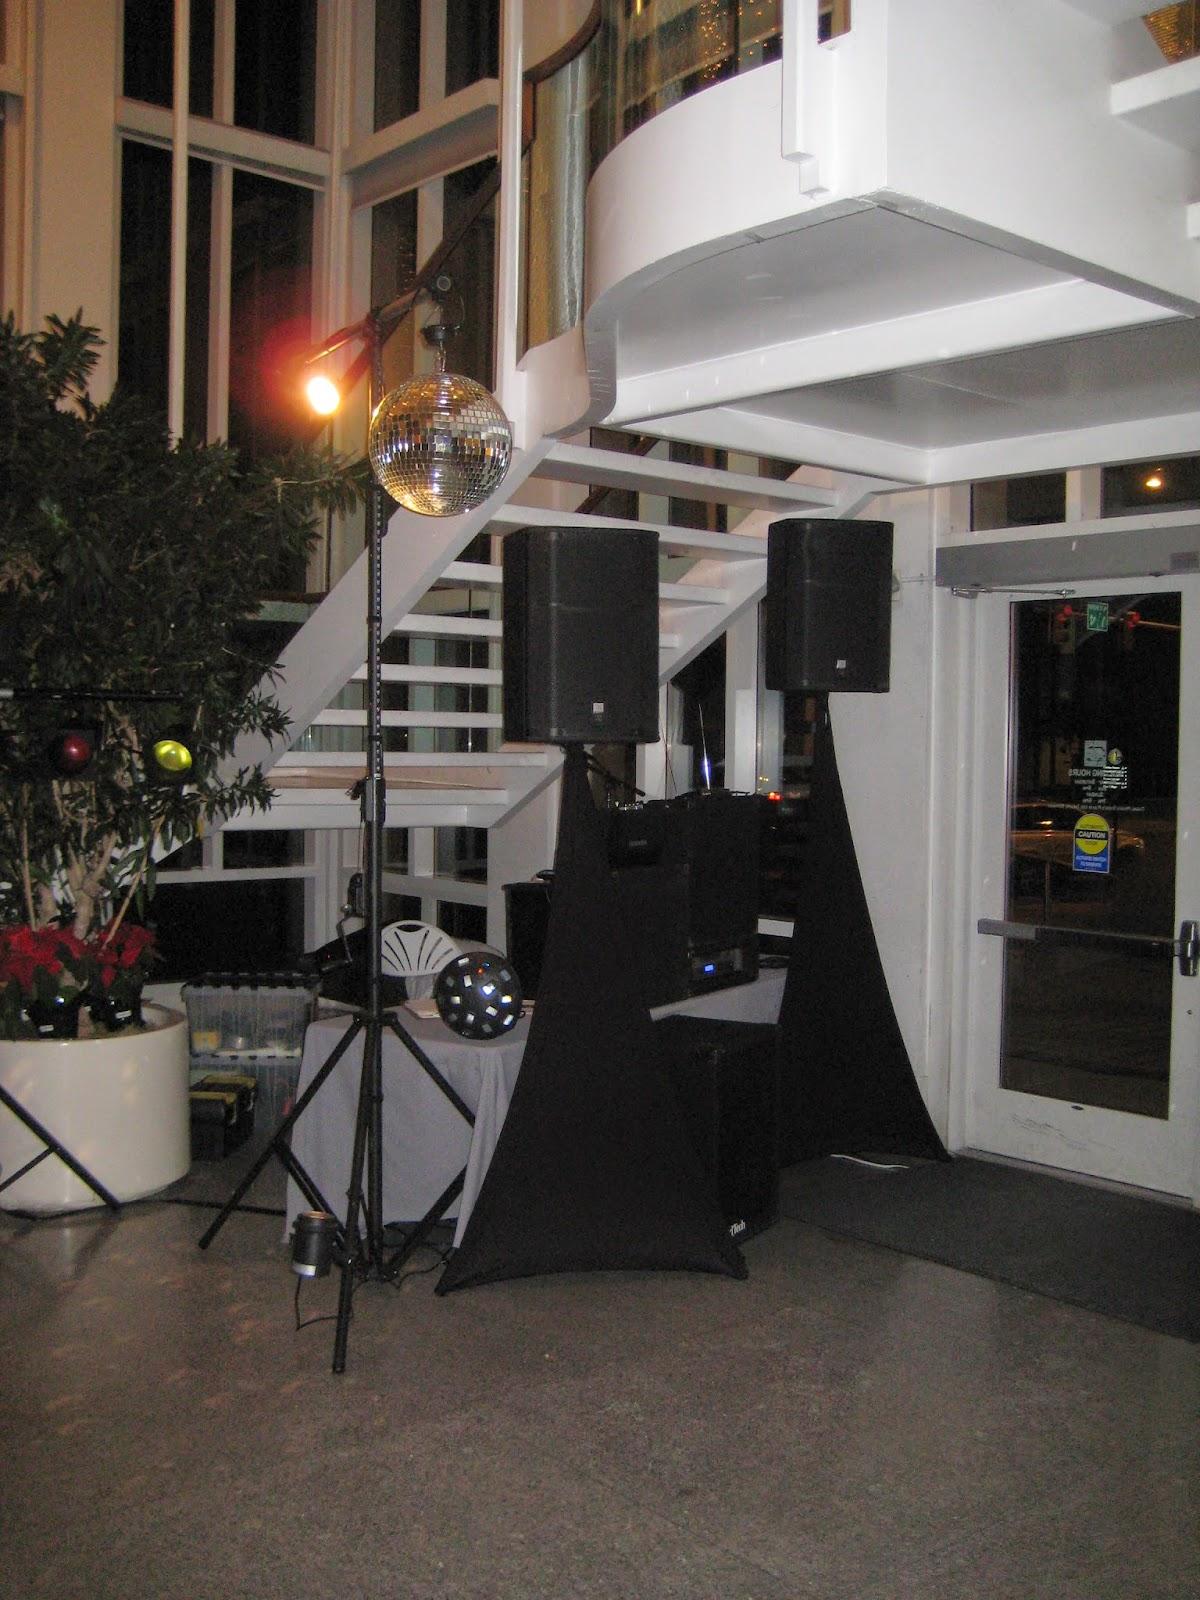 Dj Disc Jockey Karaoke Photo Booth Led Decor Wall Up